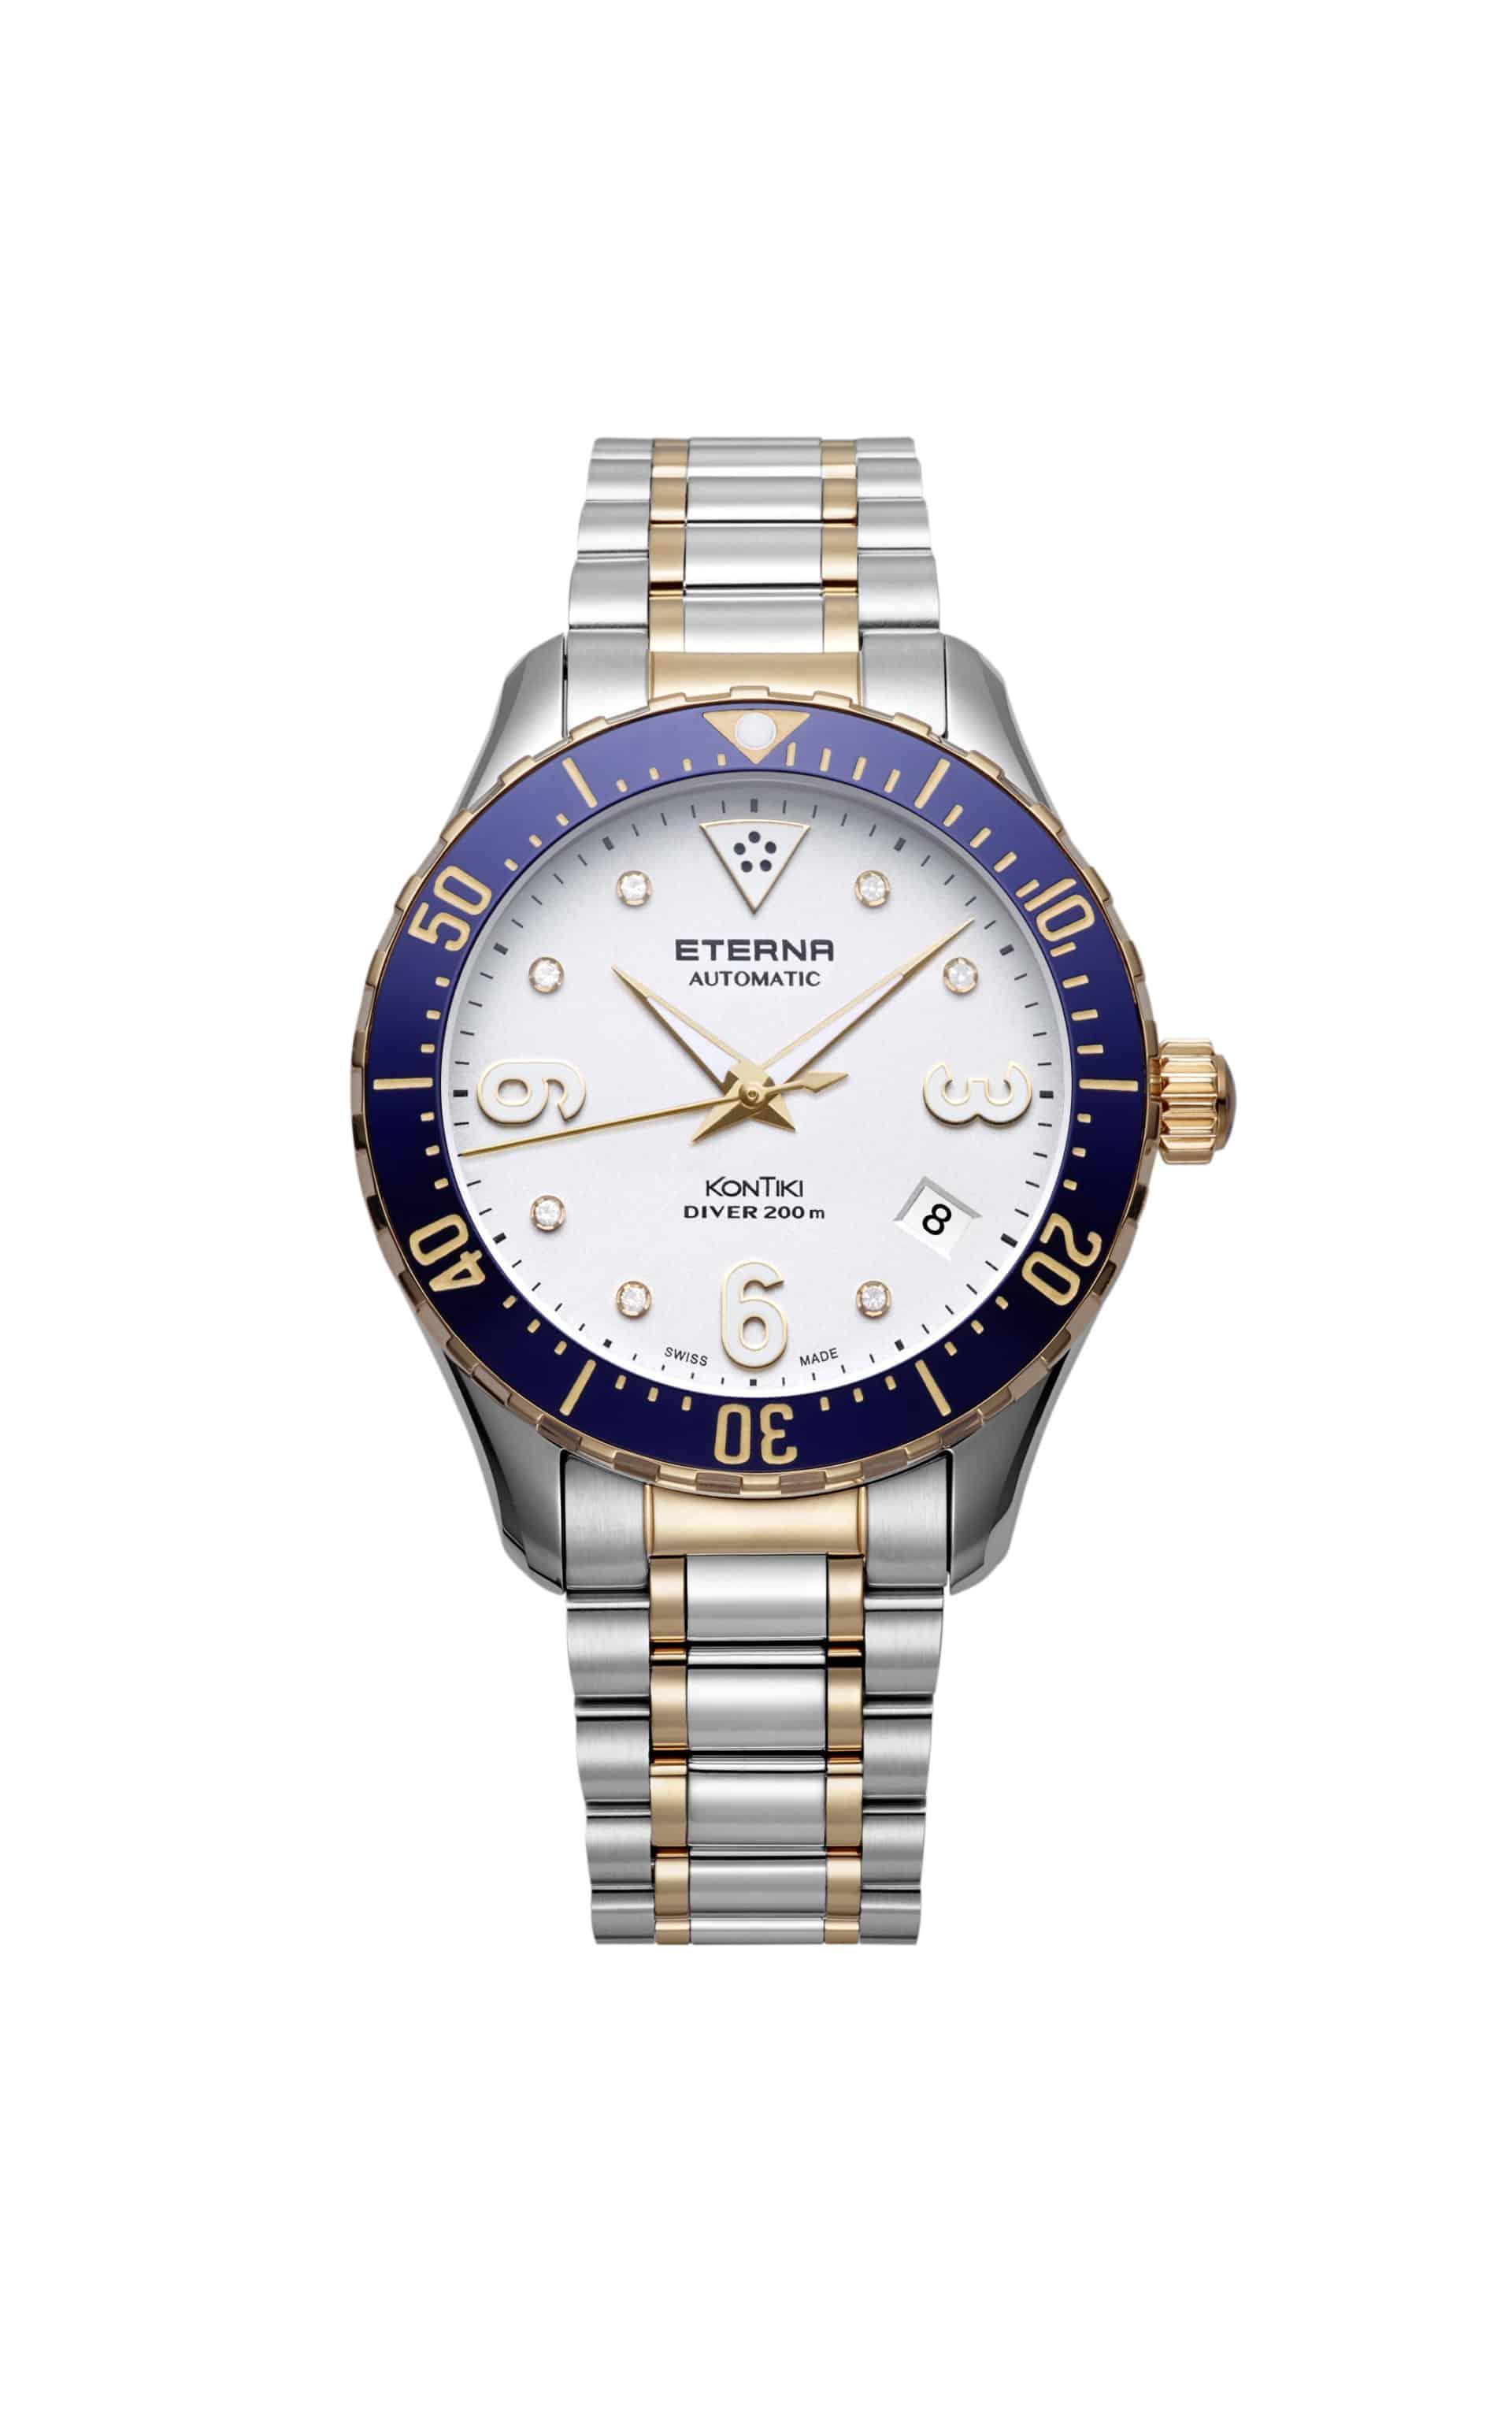 PR_Lady KonTiki Diver_Pictures_Eterna Lady KonTiki Diver_stainless steel PVD 5N, white dial, bicolor bracelet